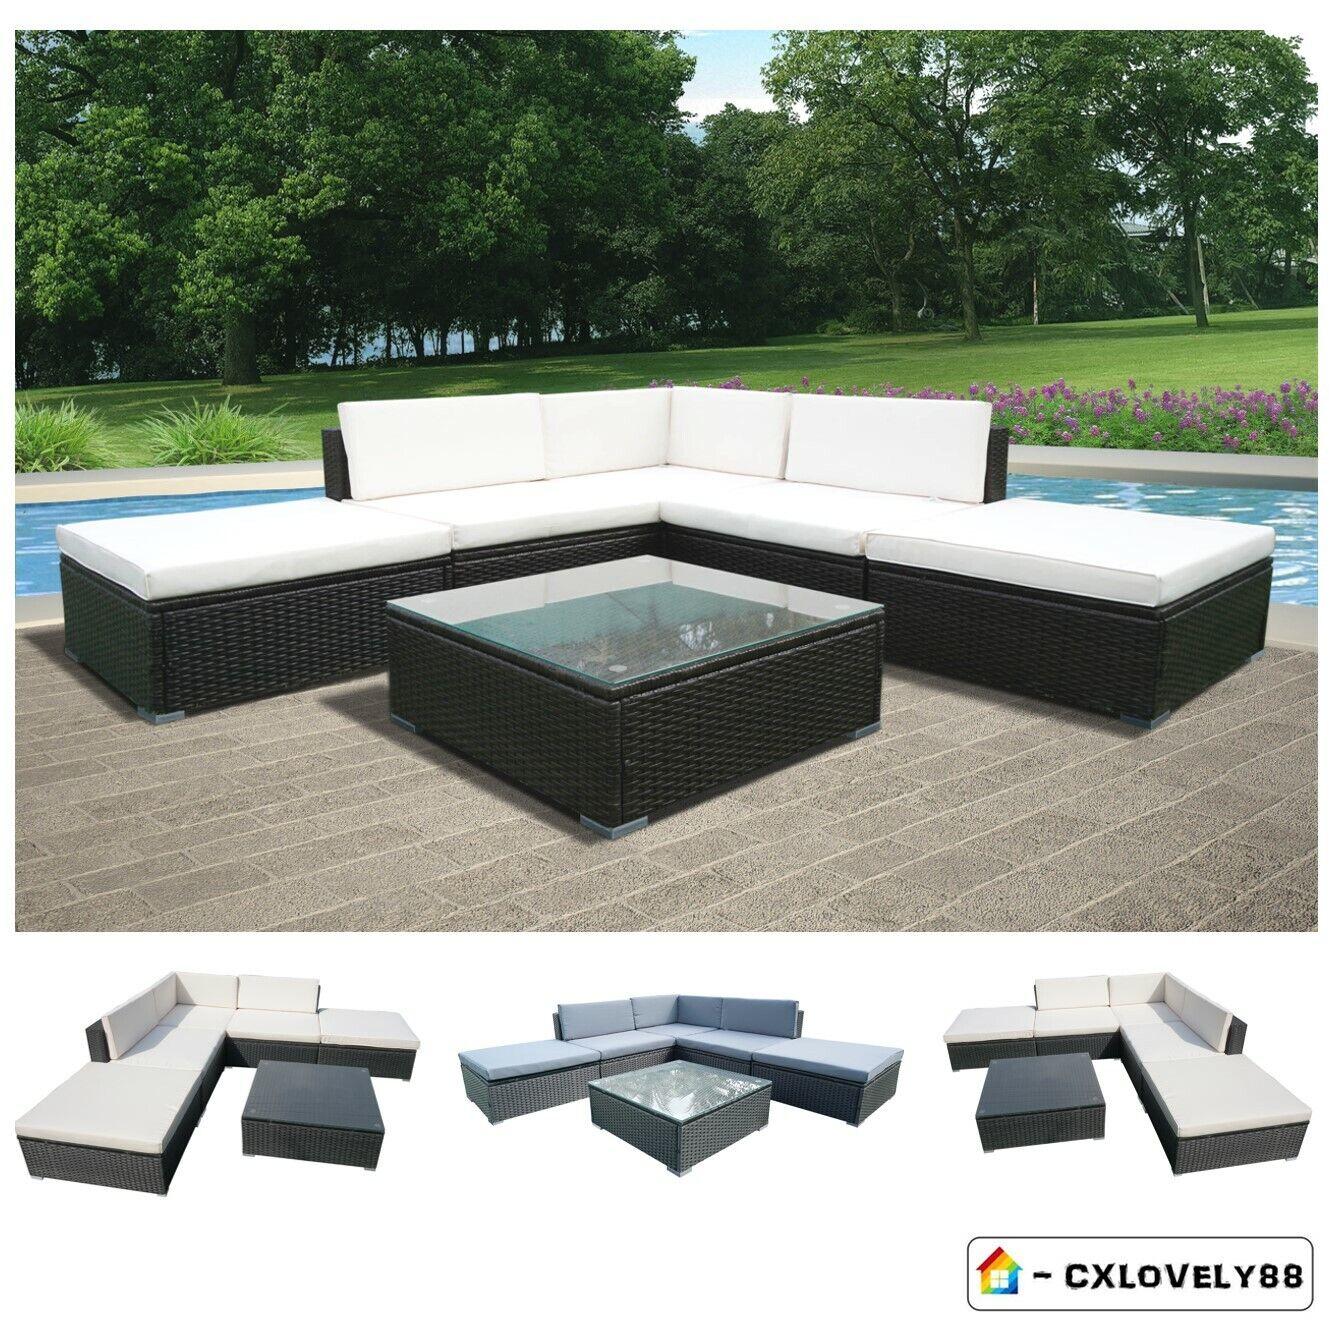 Garden Furniture - Garden Rattan Furniture Corner Sofa Table Set Outdoor Patio Rattan Set 6 Piece